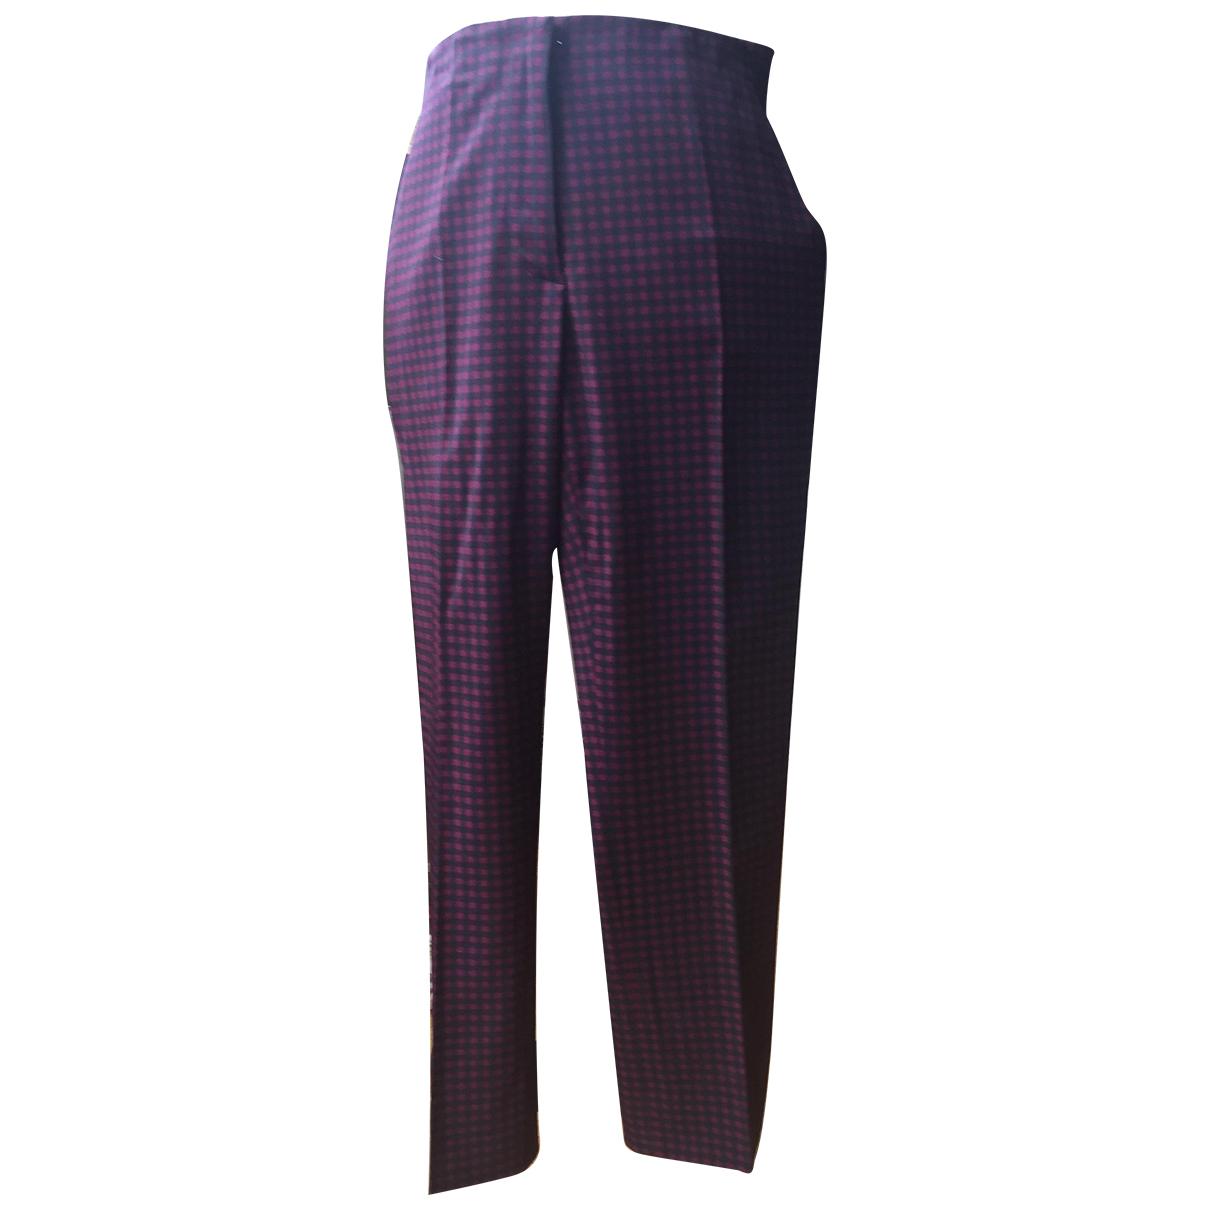 Prada N Burgundy Wool Trousers for Women 40 IT